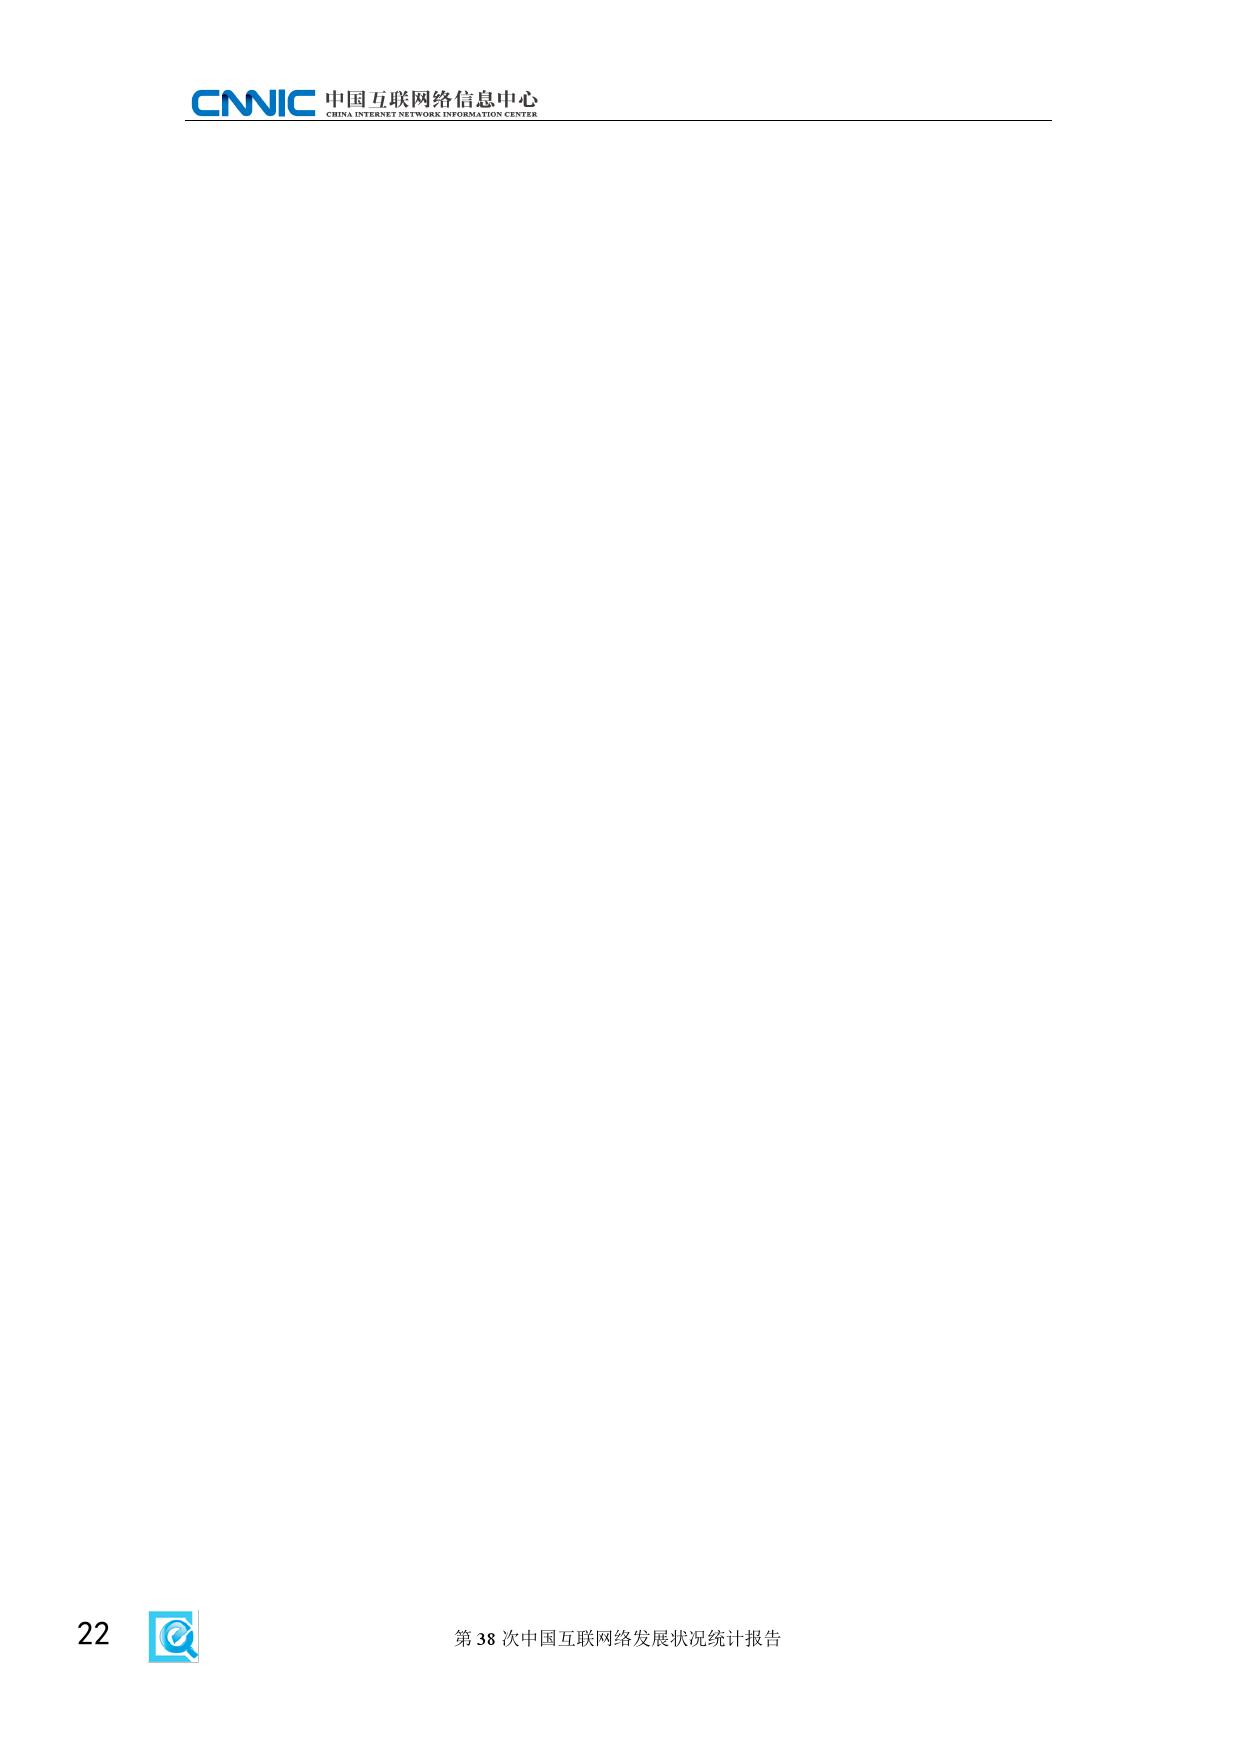 CNNIC:2015年第38次中国互联网络发展状况统计报告_000028